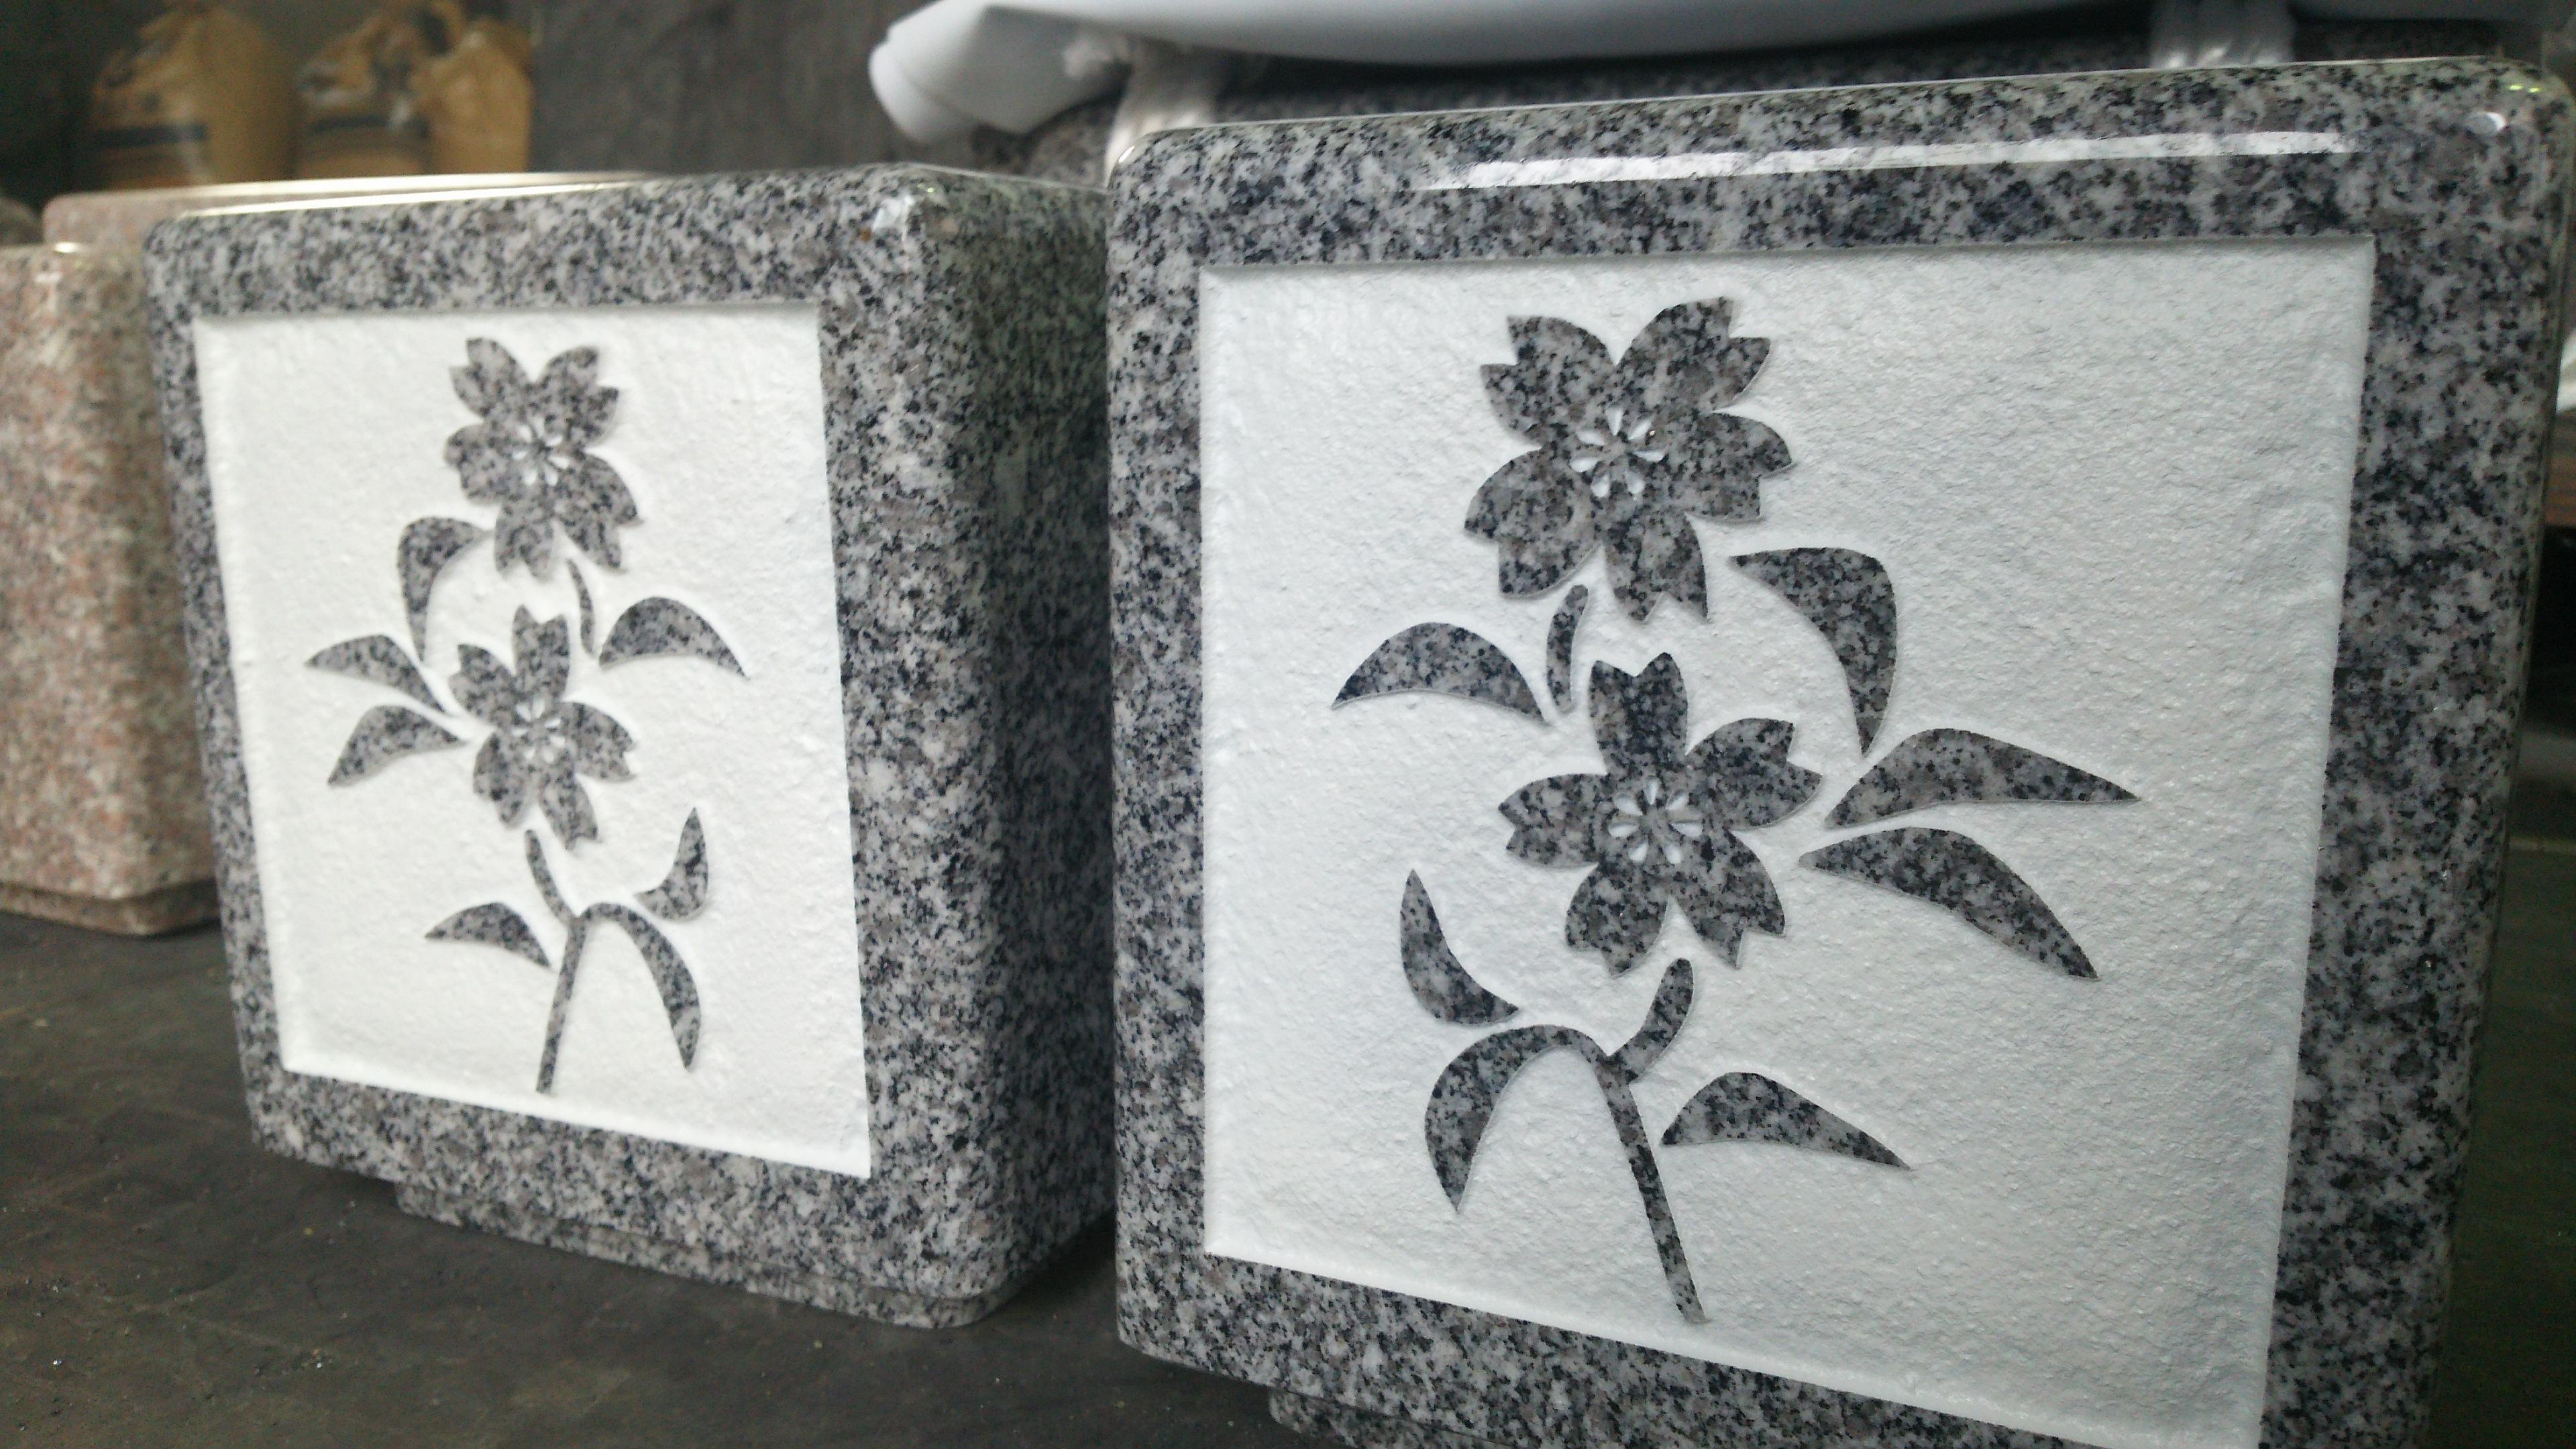 http://www.shonan-ls.co.jp/blog/stone/img/DSC_3590.JPG